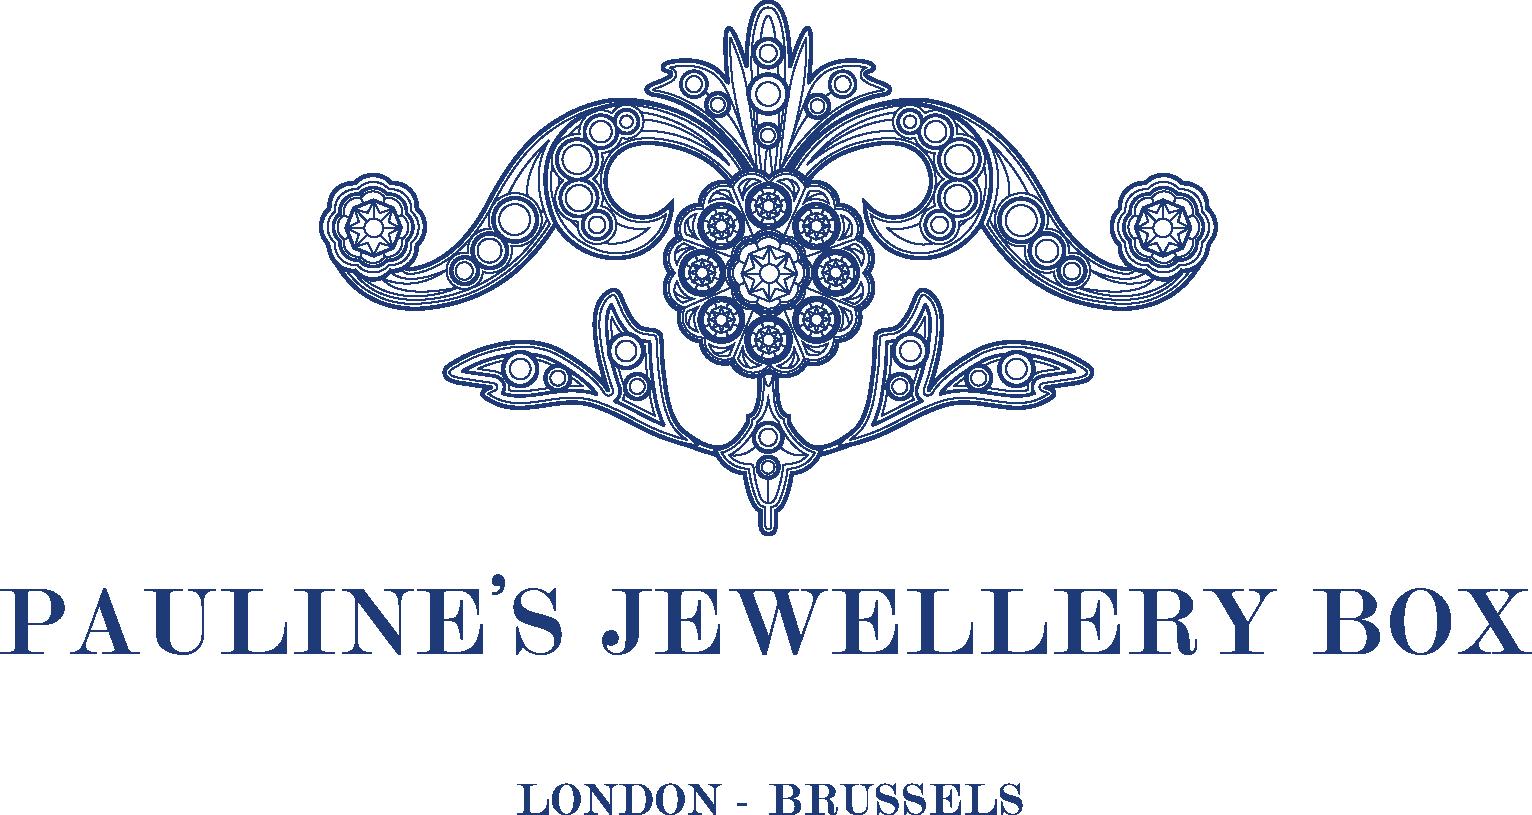 Pauline's Jewellery Box